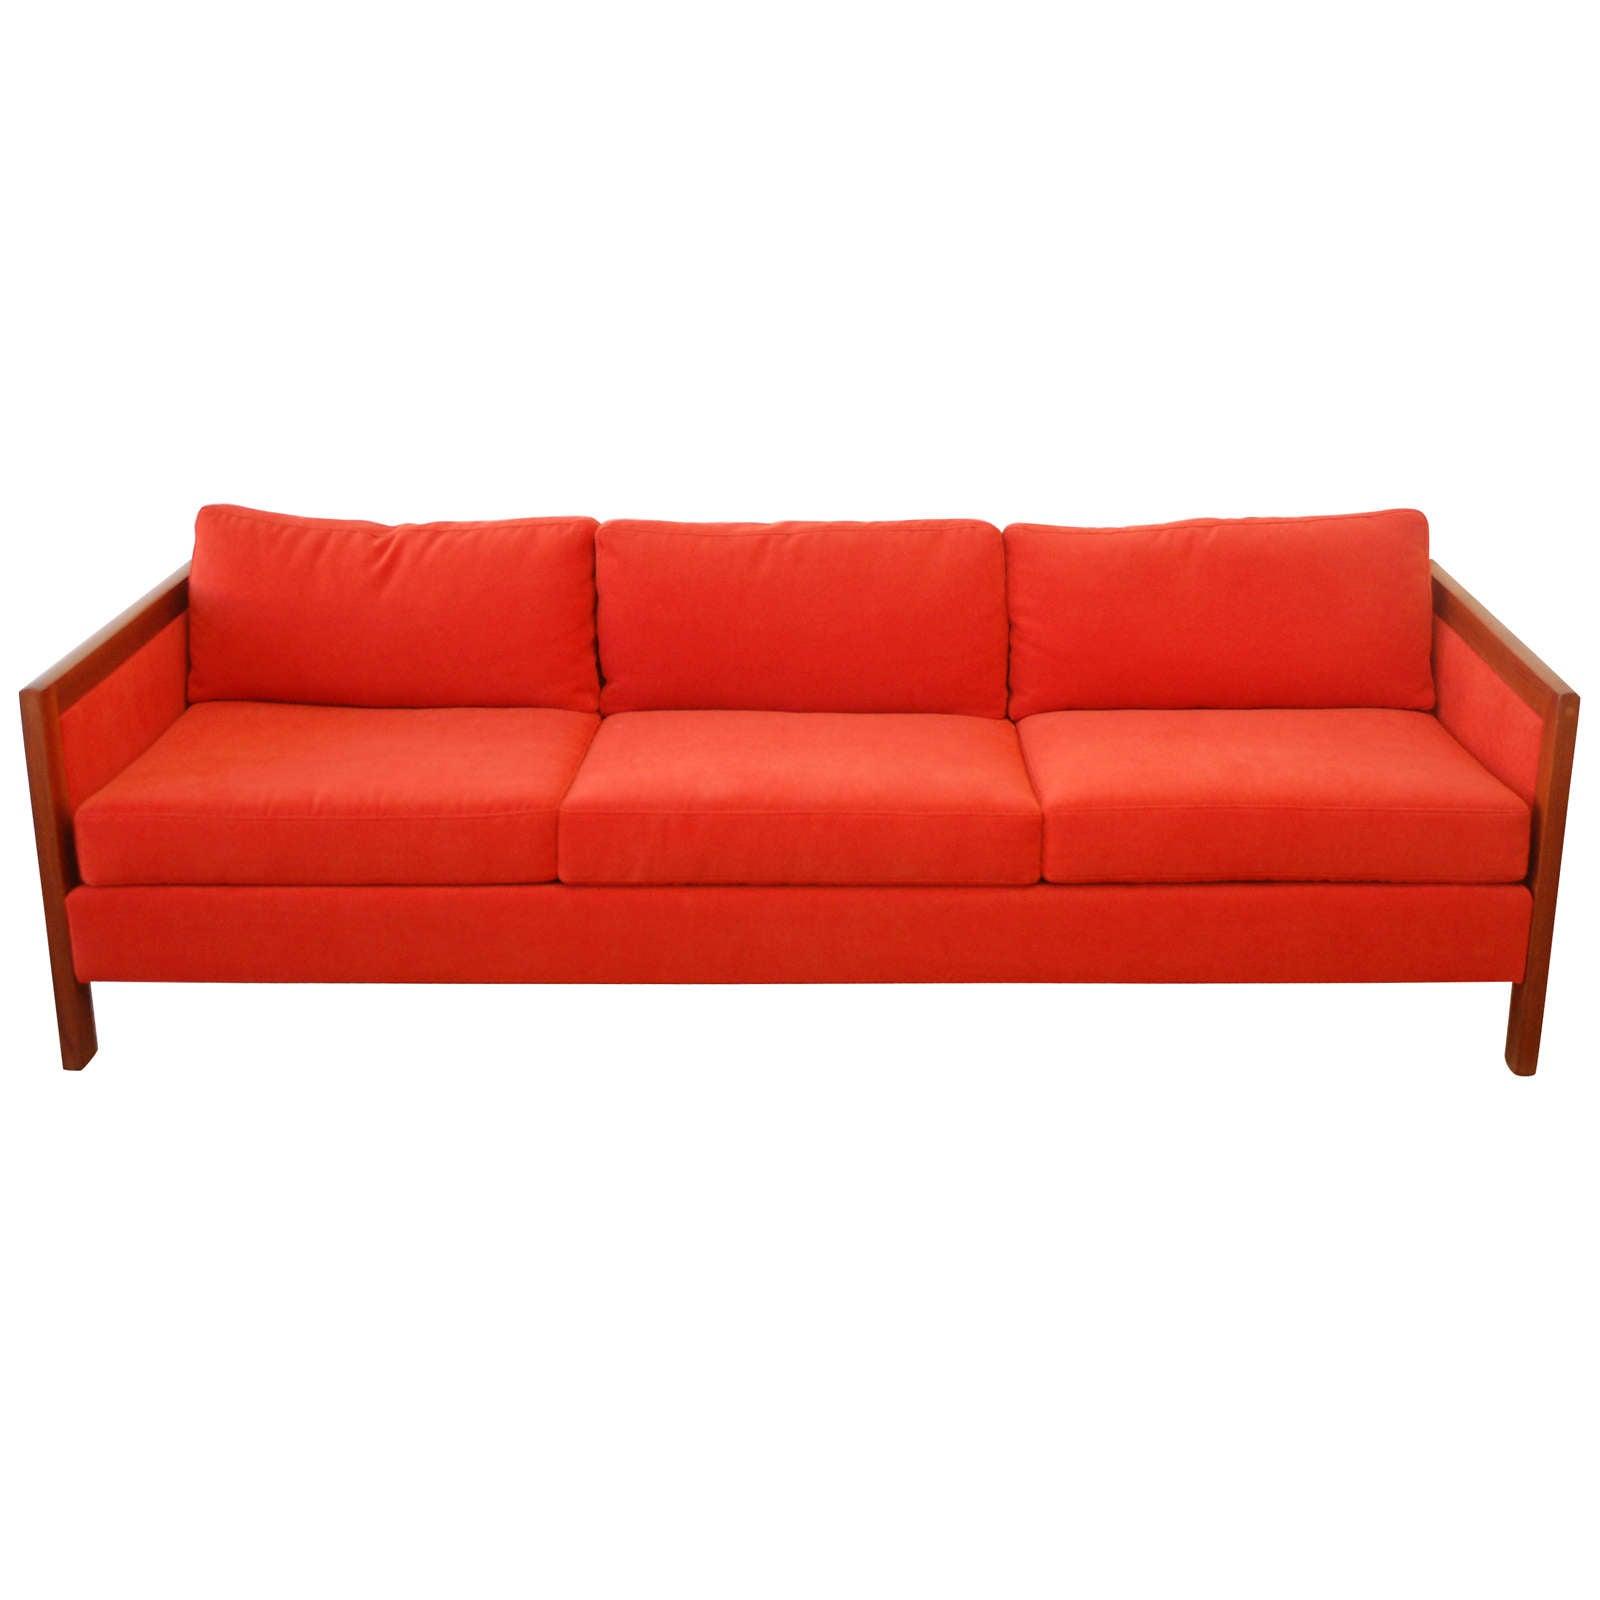 Mid Century Wood Frame Sofa